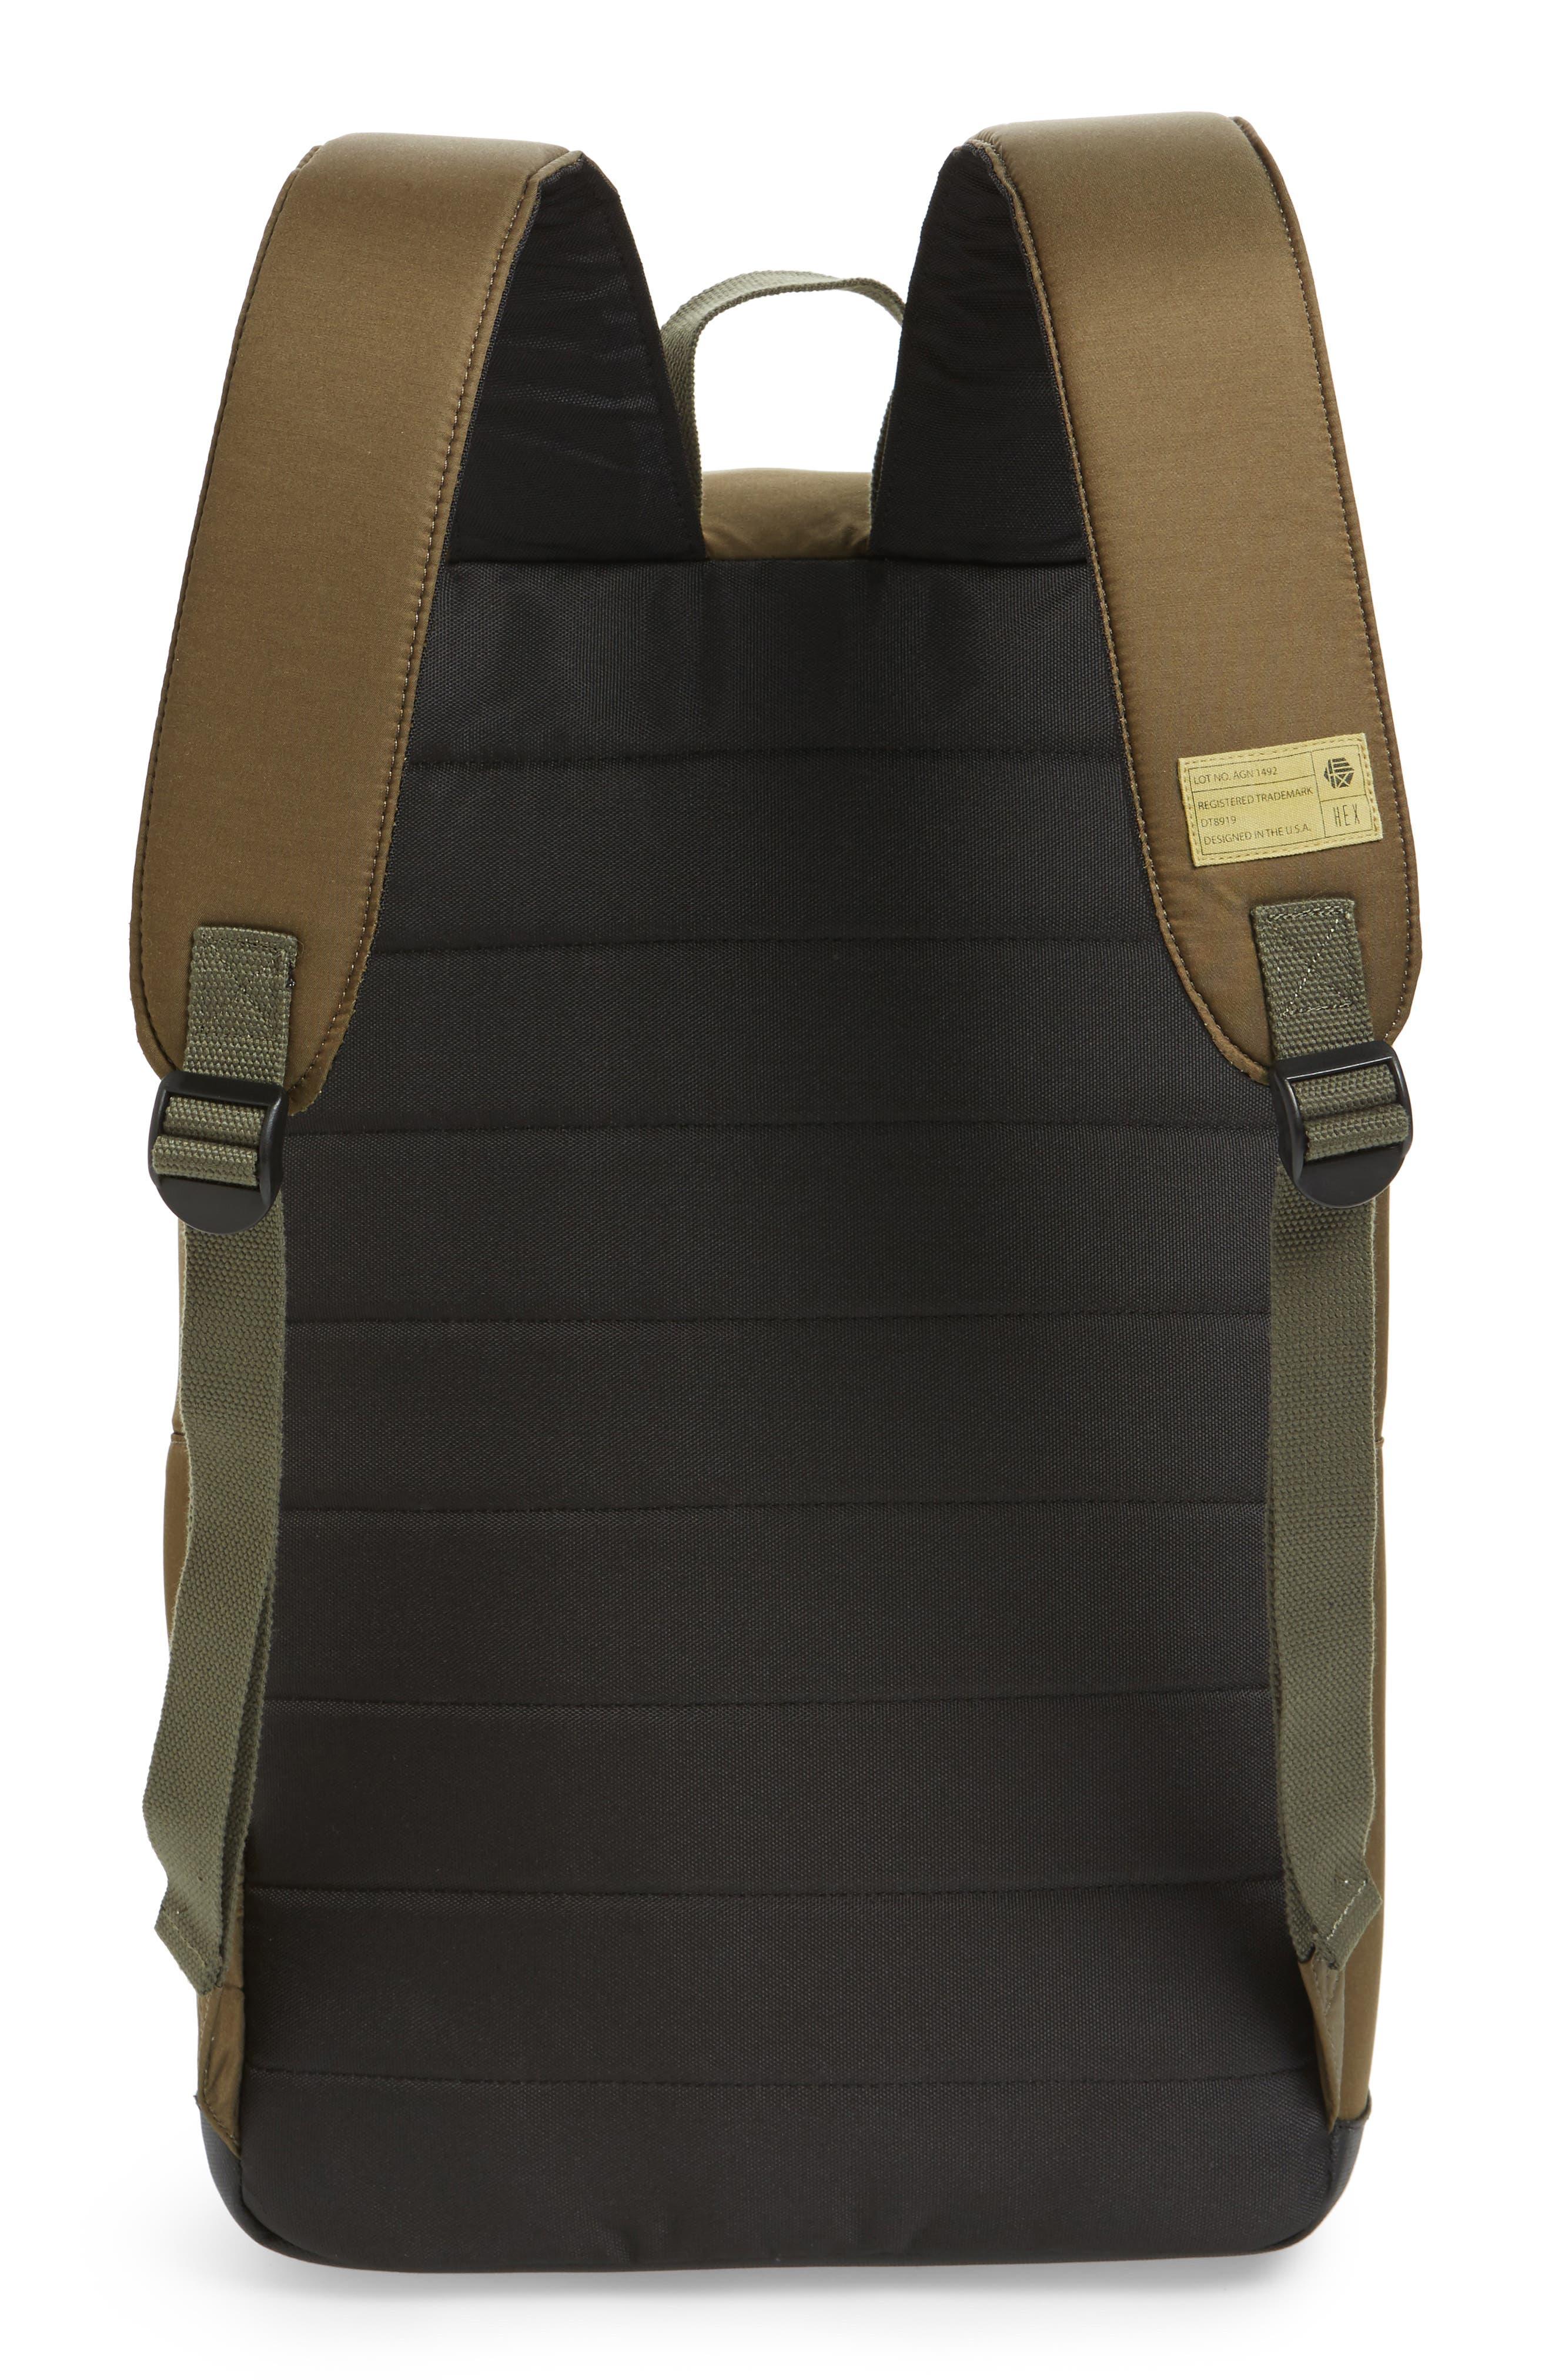 Alternate Image 3  - HEX Radar Origin Water Resistant Commuter/Travel Laptop Backpack